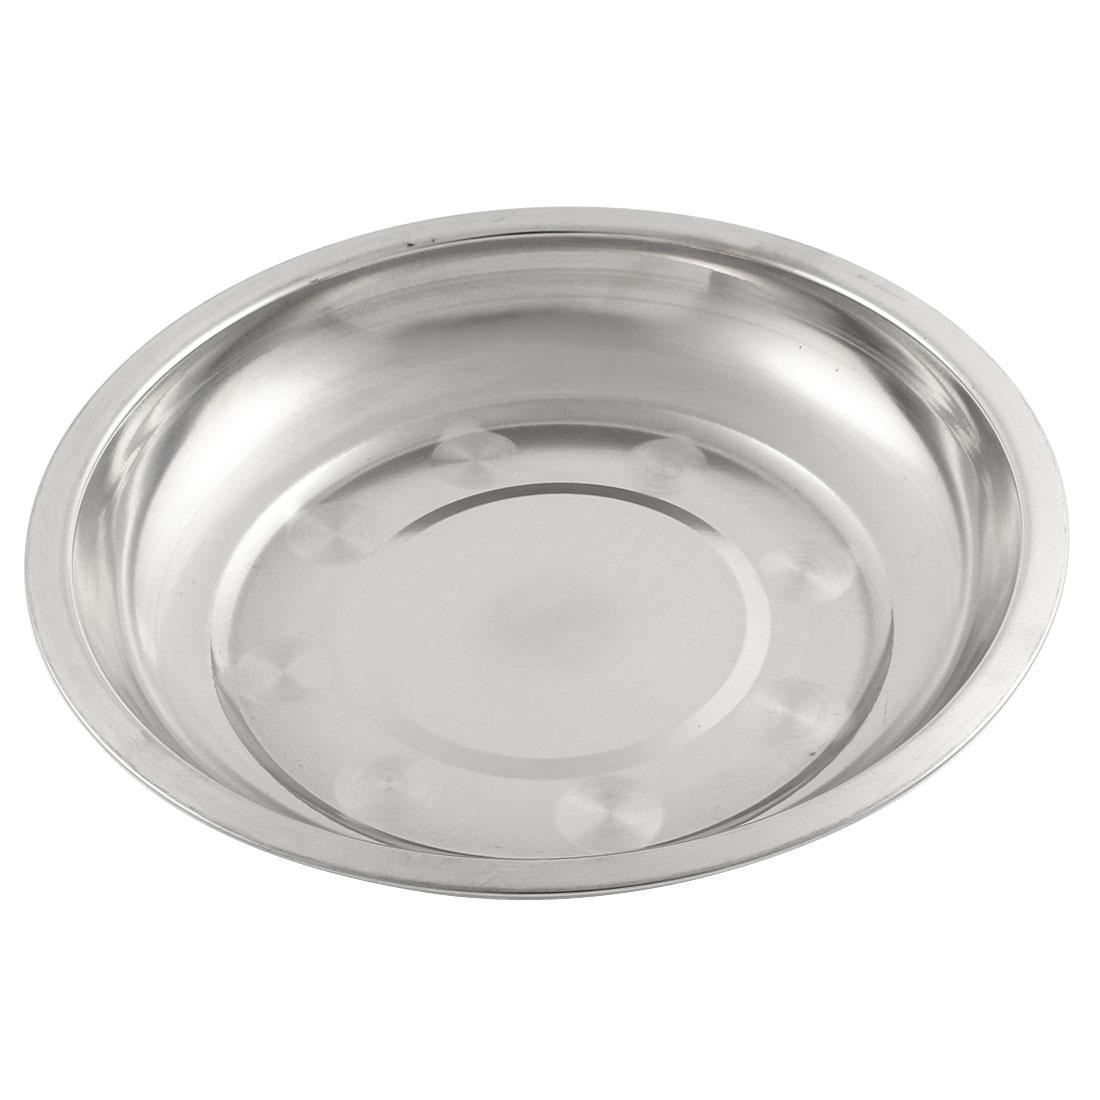 19cm x 3cm Round Silver Tone Stainless Steel Kitchen Dish Plate Food Holder